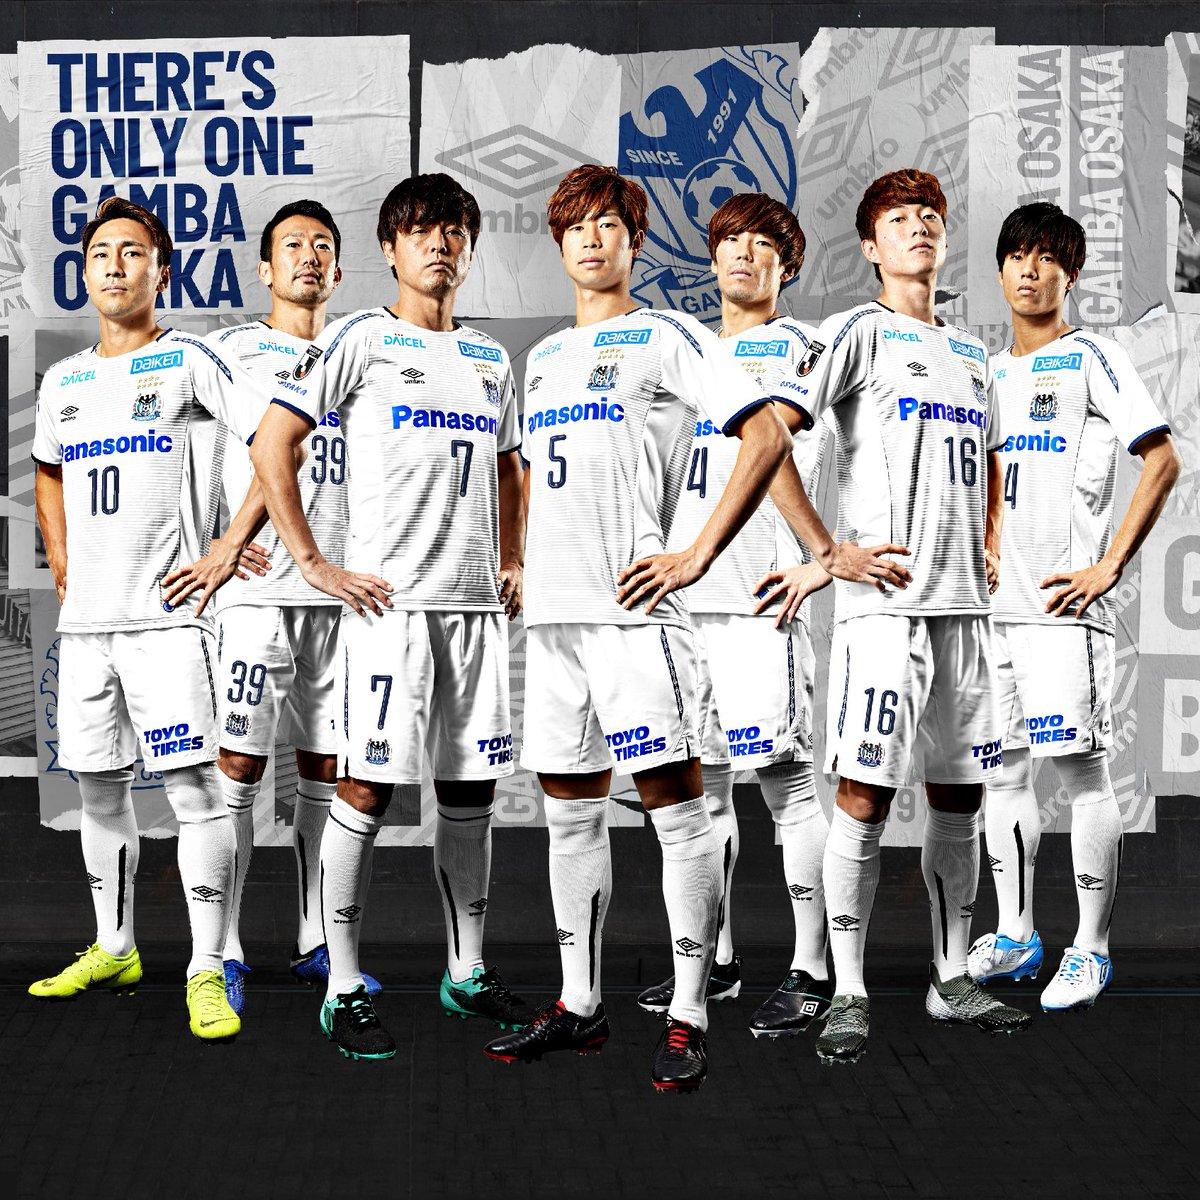 RT @umbrojp: 「Pride of Emblem ~その伝統を刻み前へ~」 ガンバ大阪2019新ユニフォーム発表 https://t.co/ecPG0lYAqR #ガンバ大阪 #GAMBAOSAKA https://t.co/W6XyxzMpFE